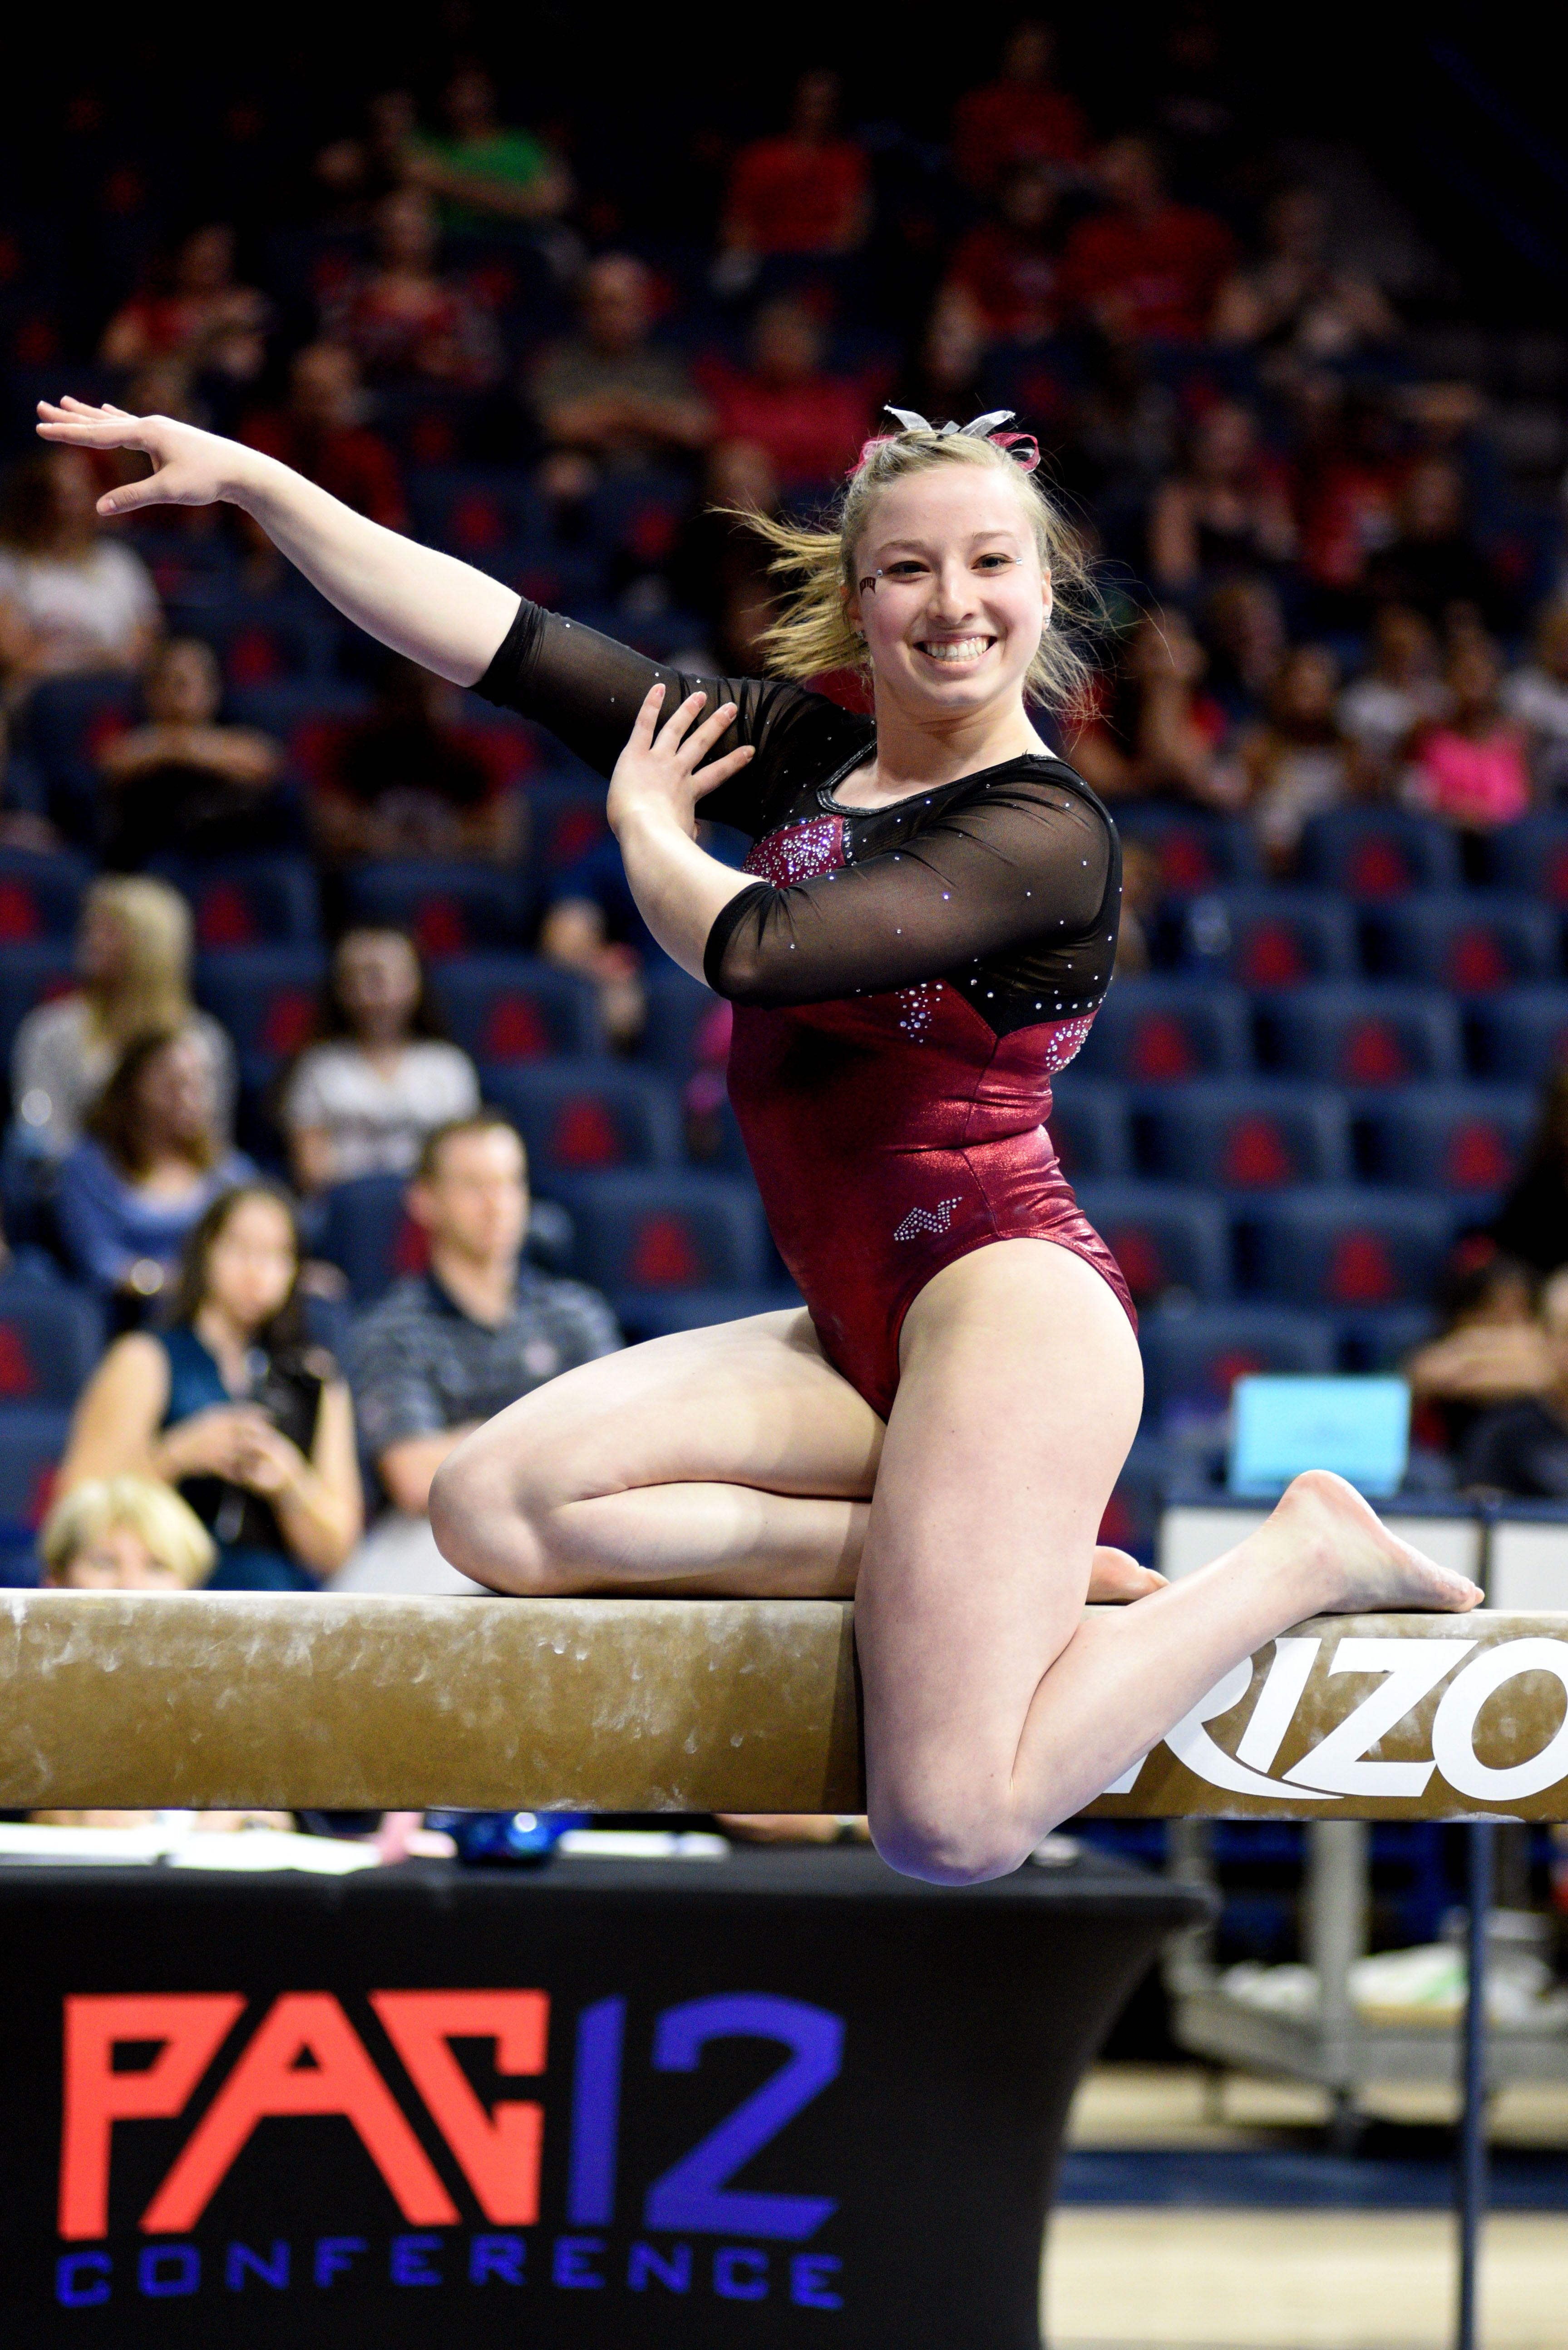 Winwin gymnastics - Gymnastics